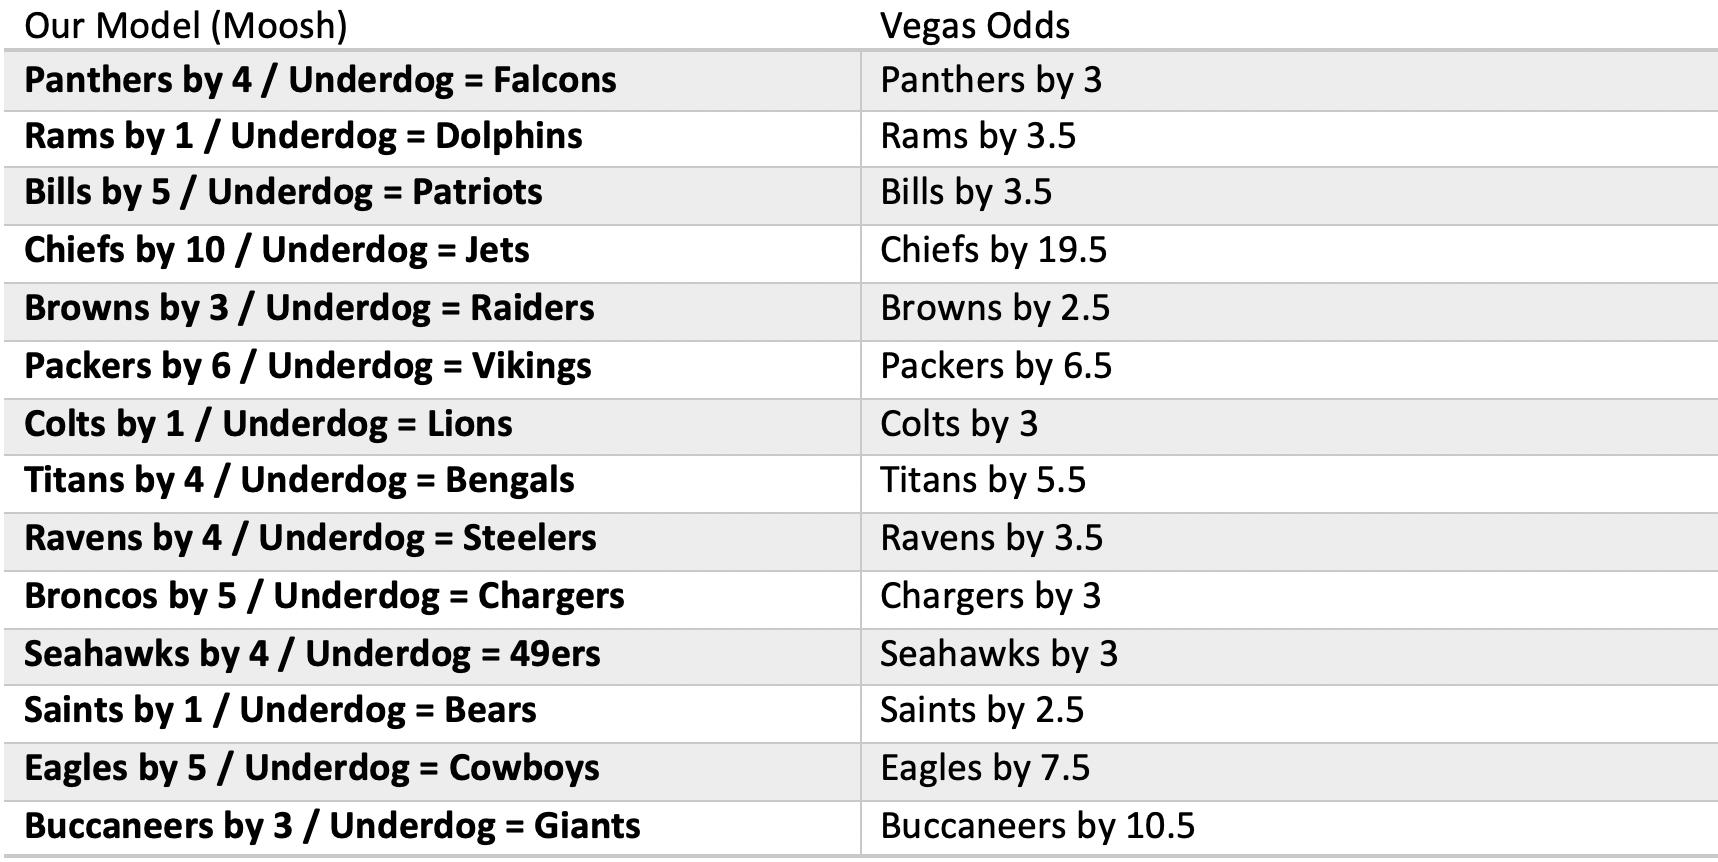 Odds from Moosh Model for Week 8 of 2020 NFL Season